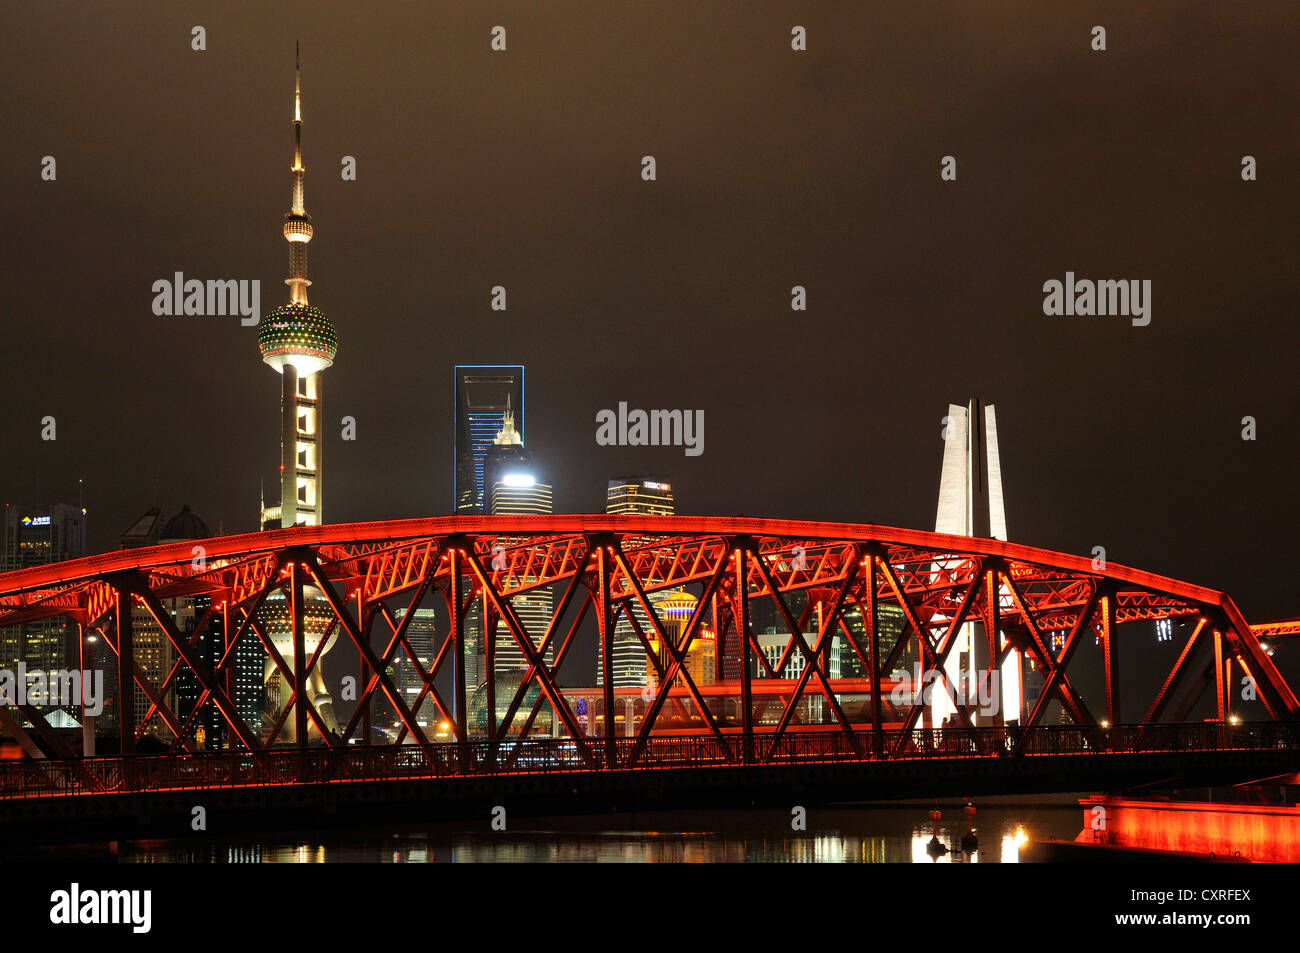 Waibaidu Bridge, Oriental Pearl Tower, skyline on the Bund promenade, Huangpu River, Shanghai, China, Asia Stock Photo